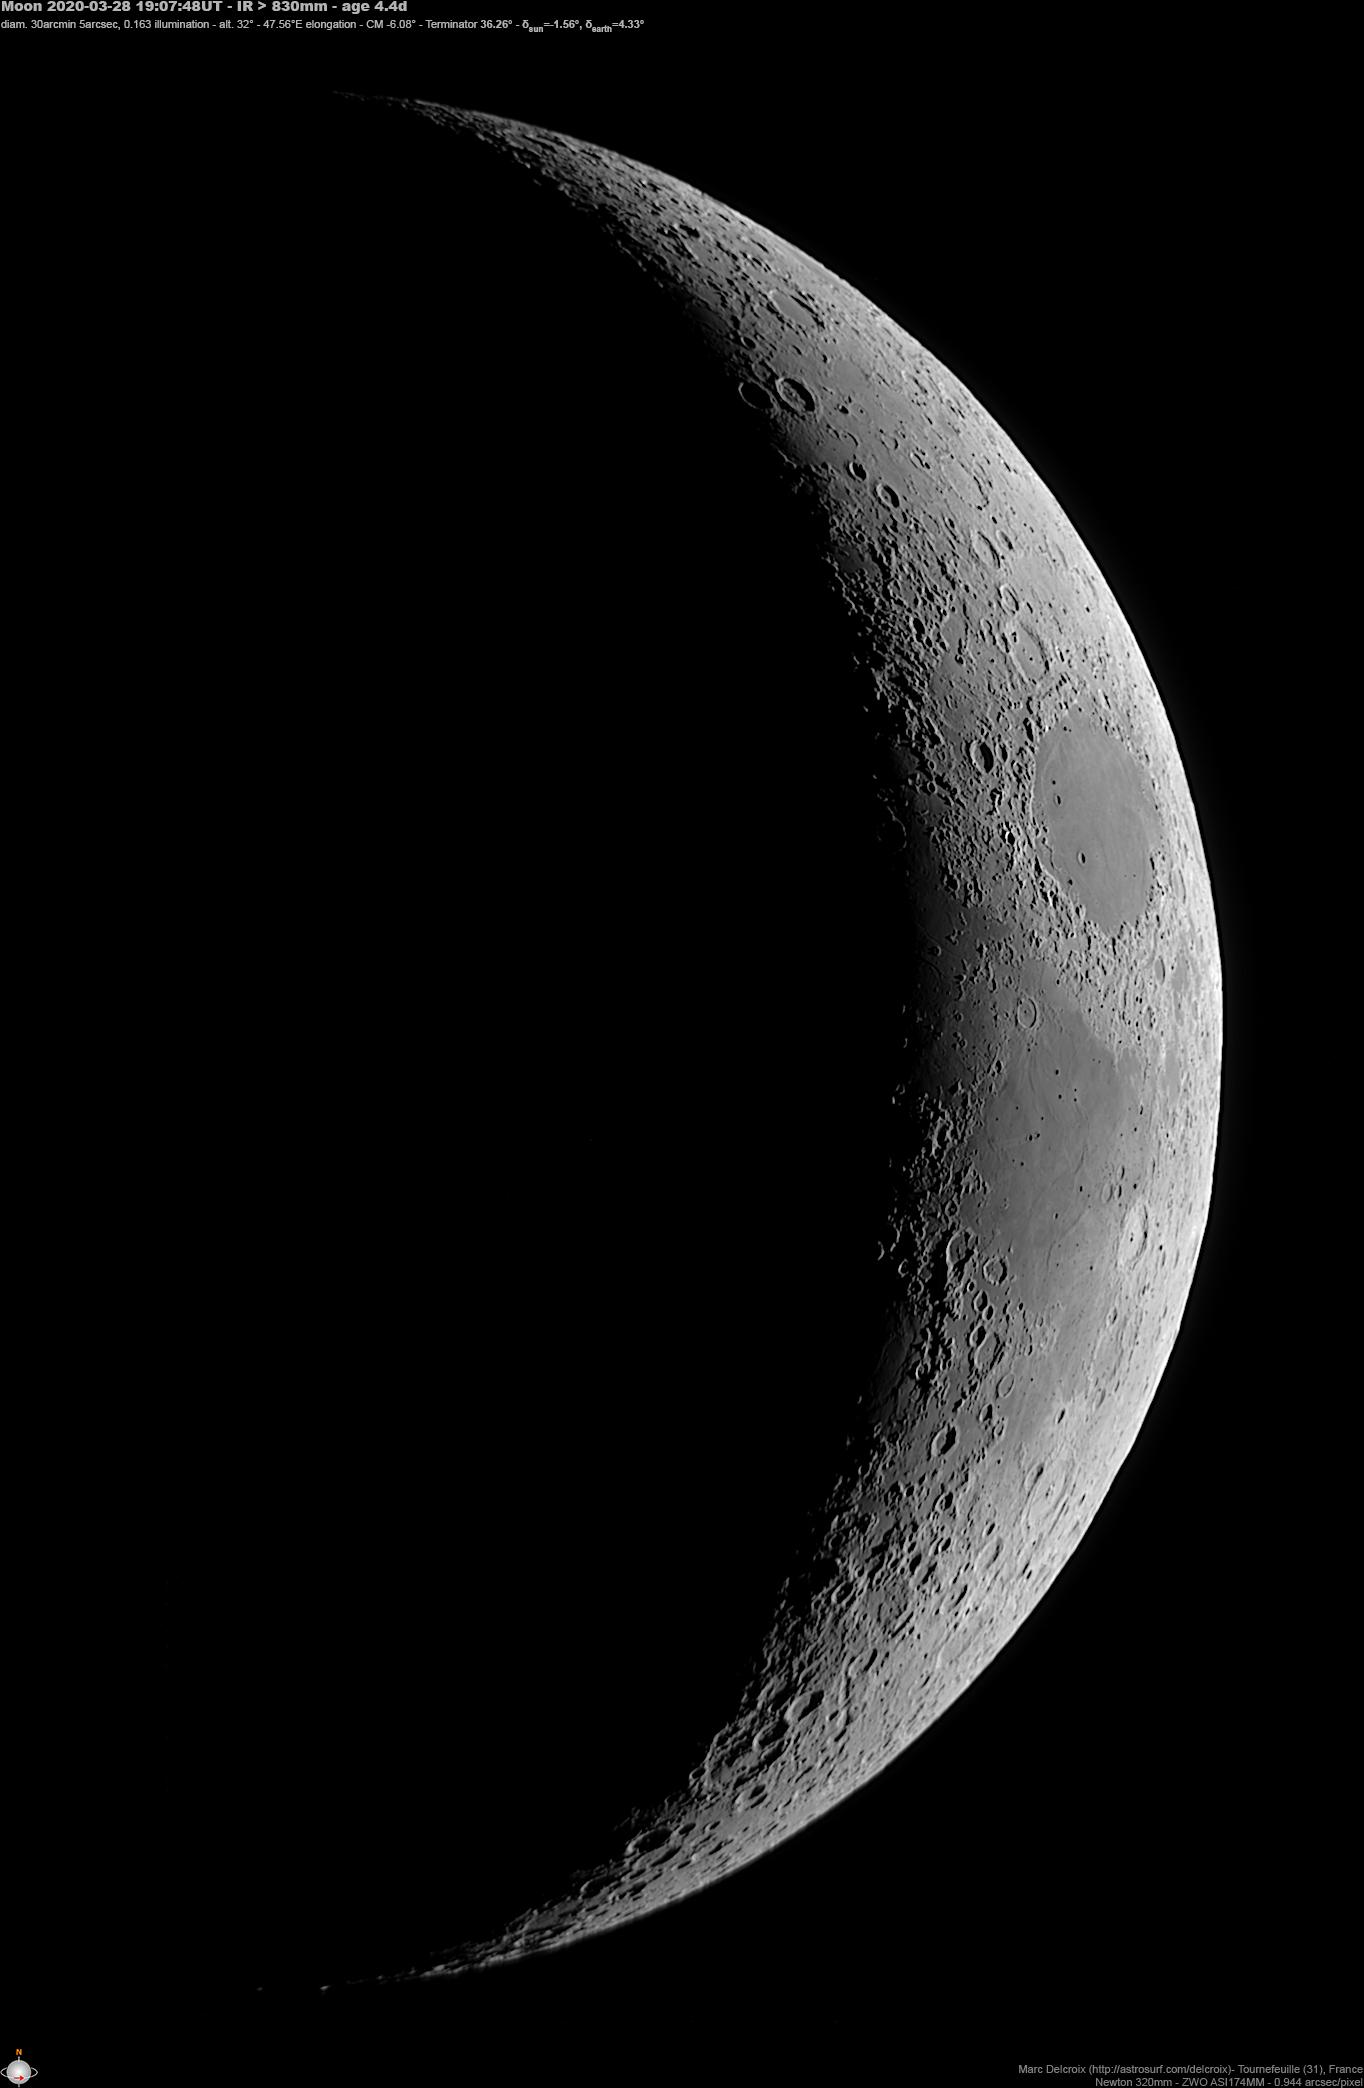 moon2020-03-28_19-07-50_4.4d-ir830_md.jp